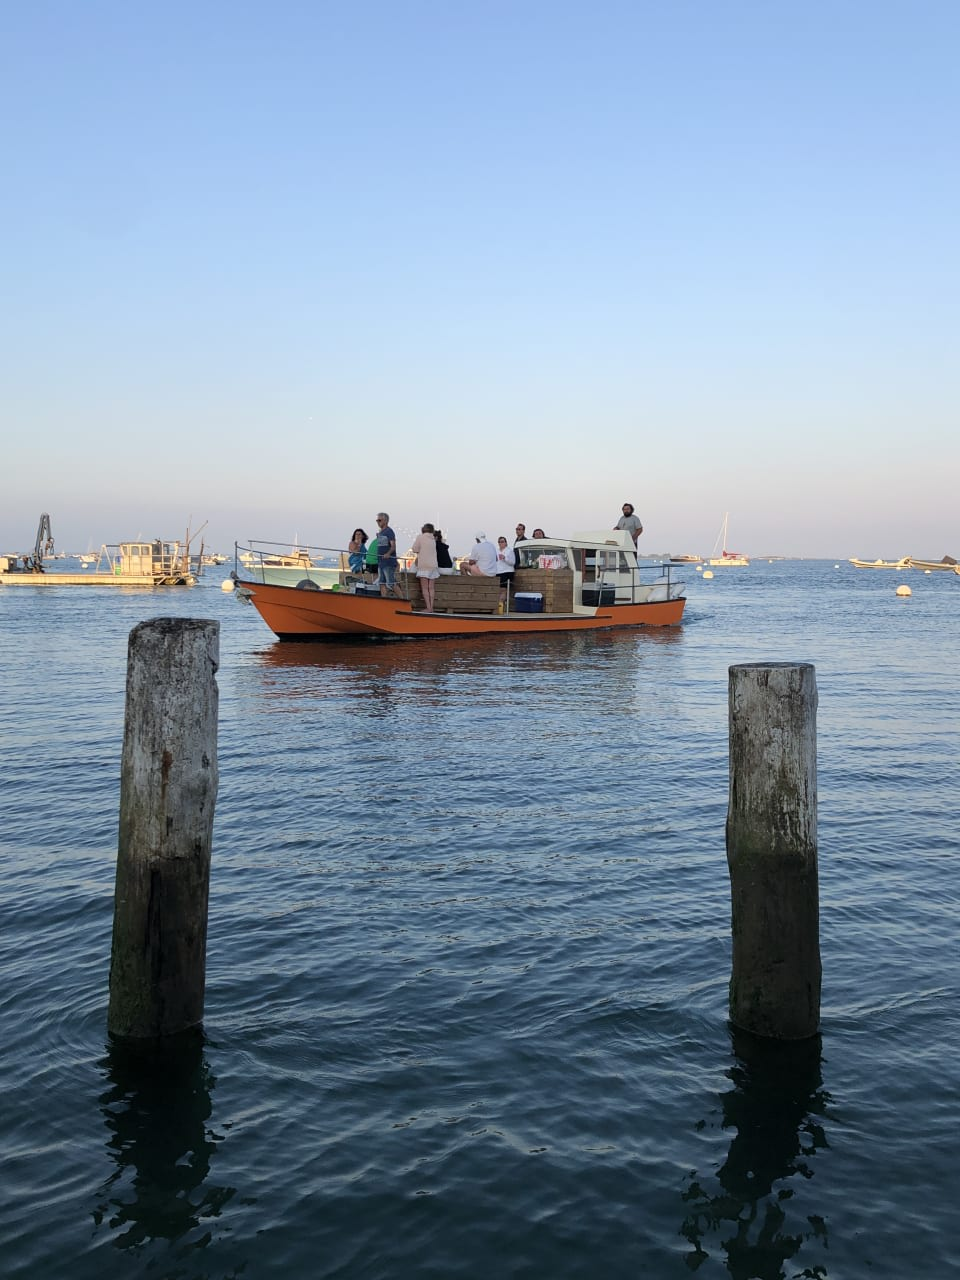 Location bateau entre amis - Bassin d'Arcachon - JL Location